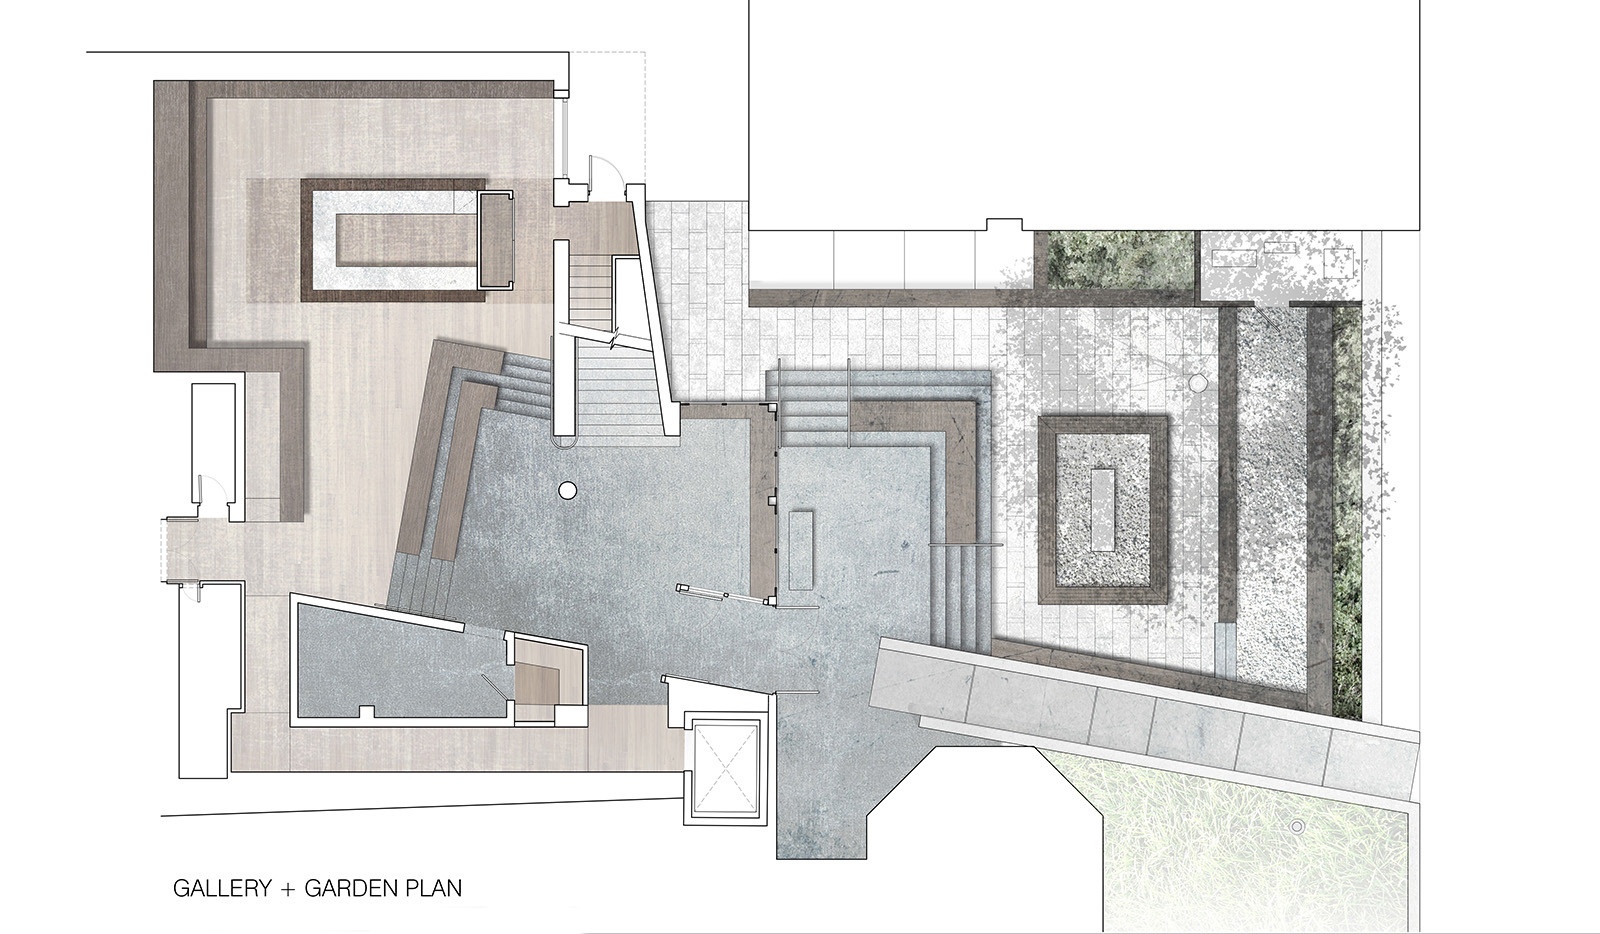 02 gallery + garden plan.JPG